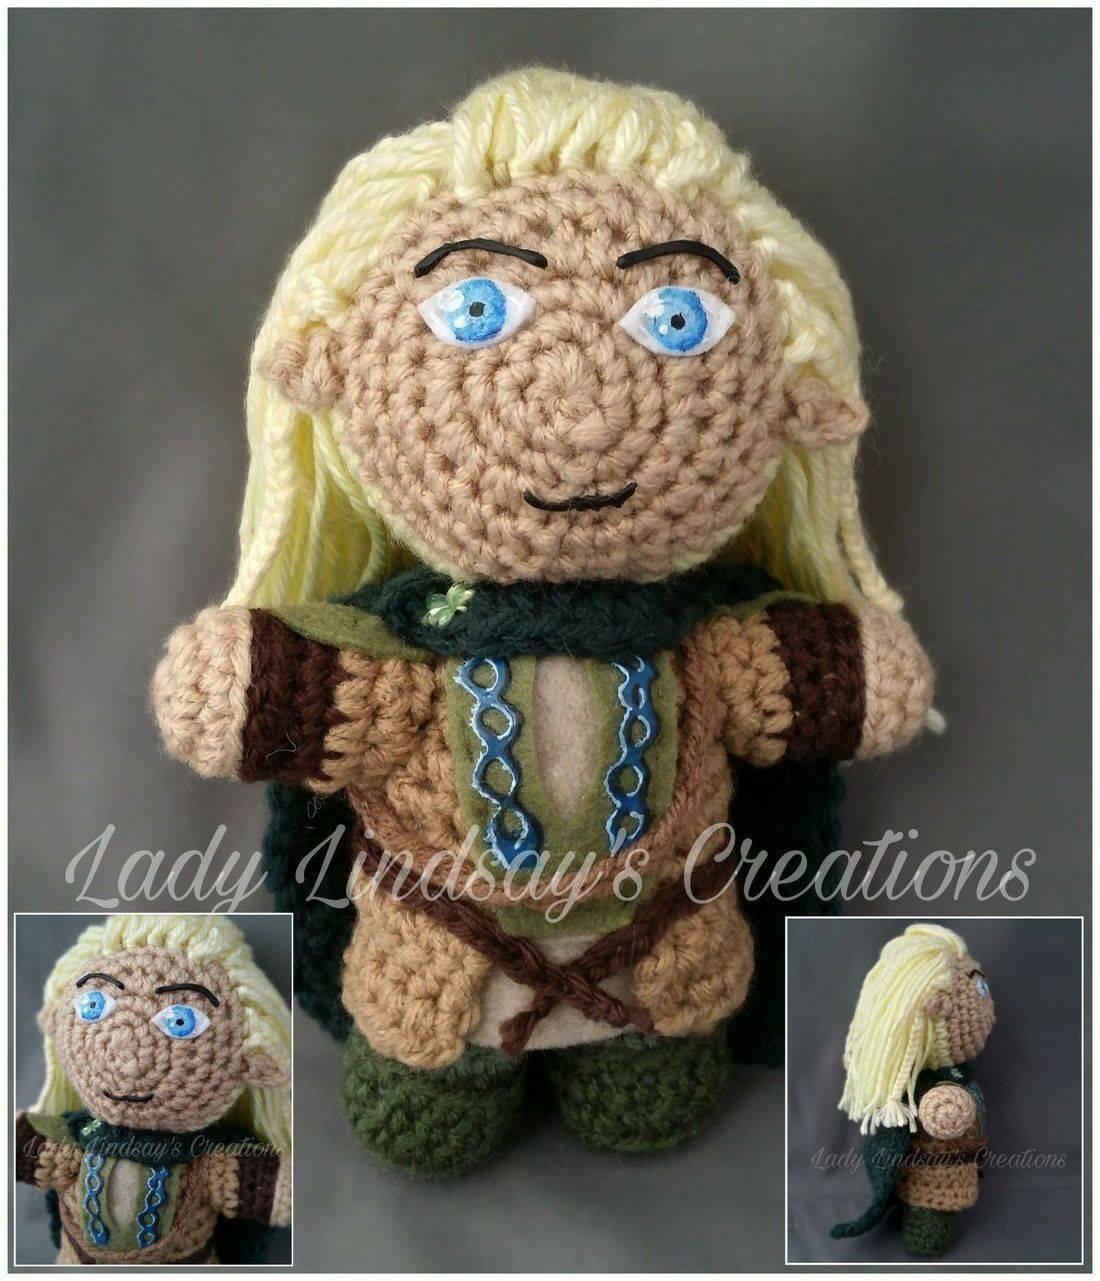 Legolas, Elf, Elve, amigurumi, Lord of the Rings, The Hobbit, plush, doll, crochet, knit, shop small, handmade, handcraft, craft, art, paint, artisan, nerd, geek, otaku, fantasy, anime, kawaii